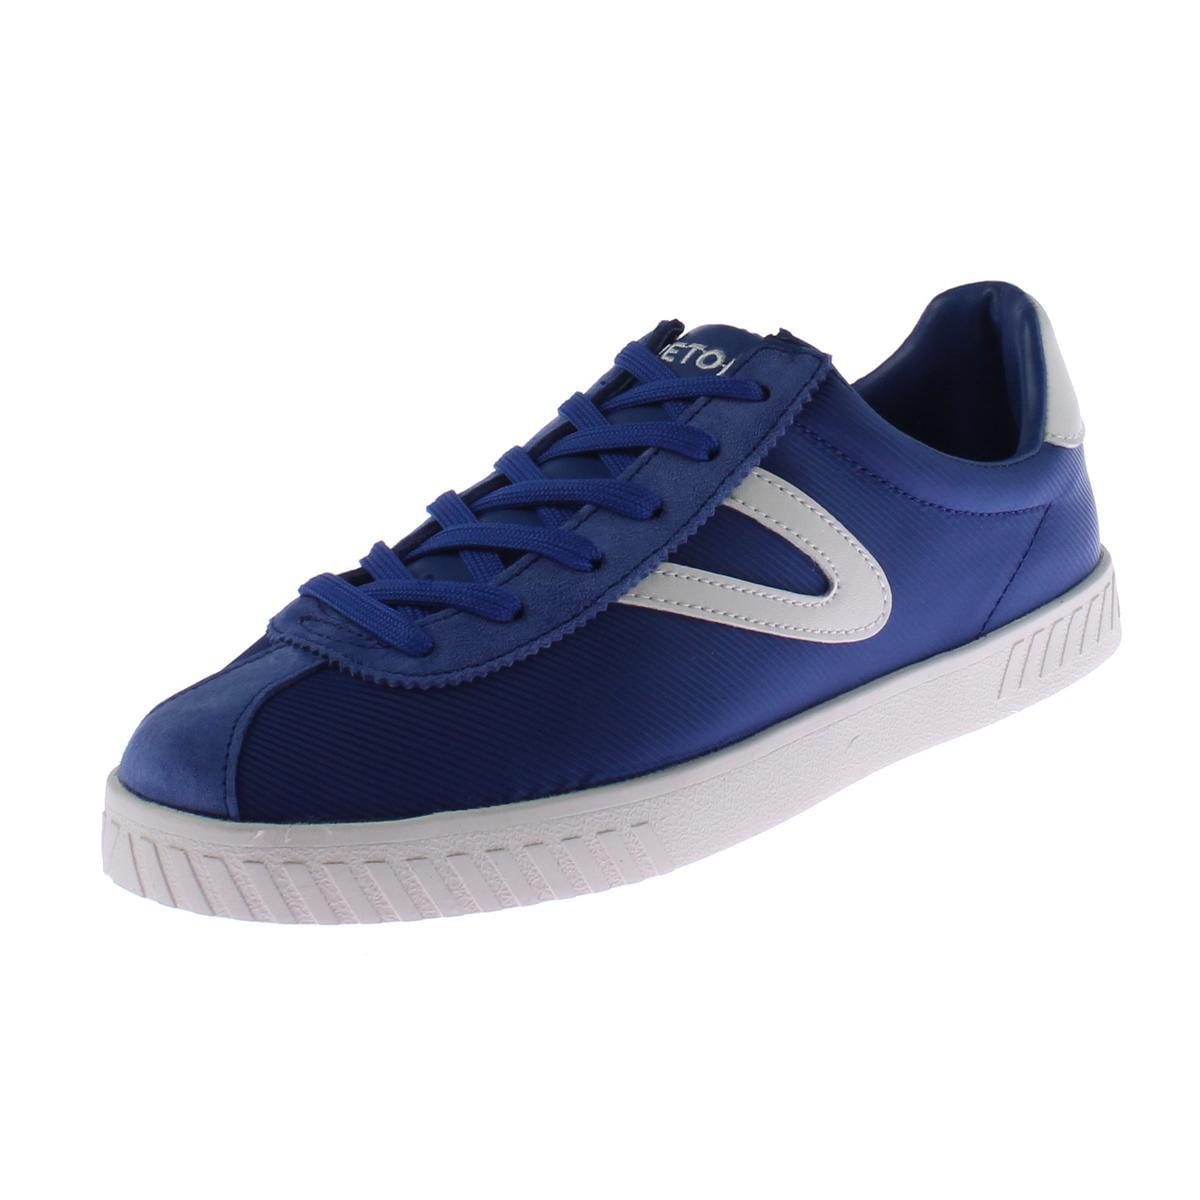 Tretorn Womens Camden4 Suede Trim Casual Fashion Sneakers by Tretorn